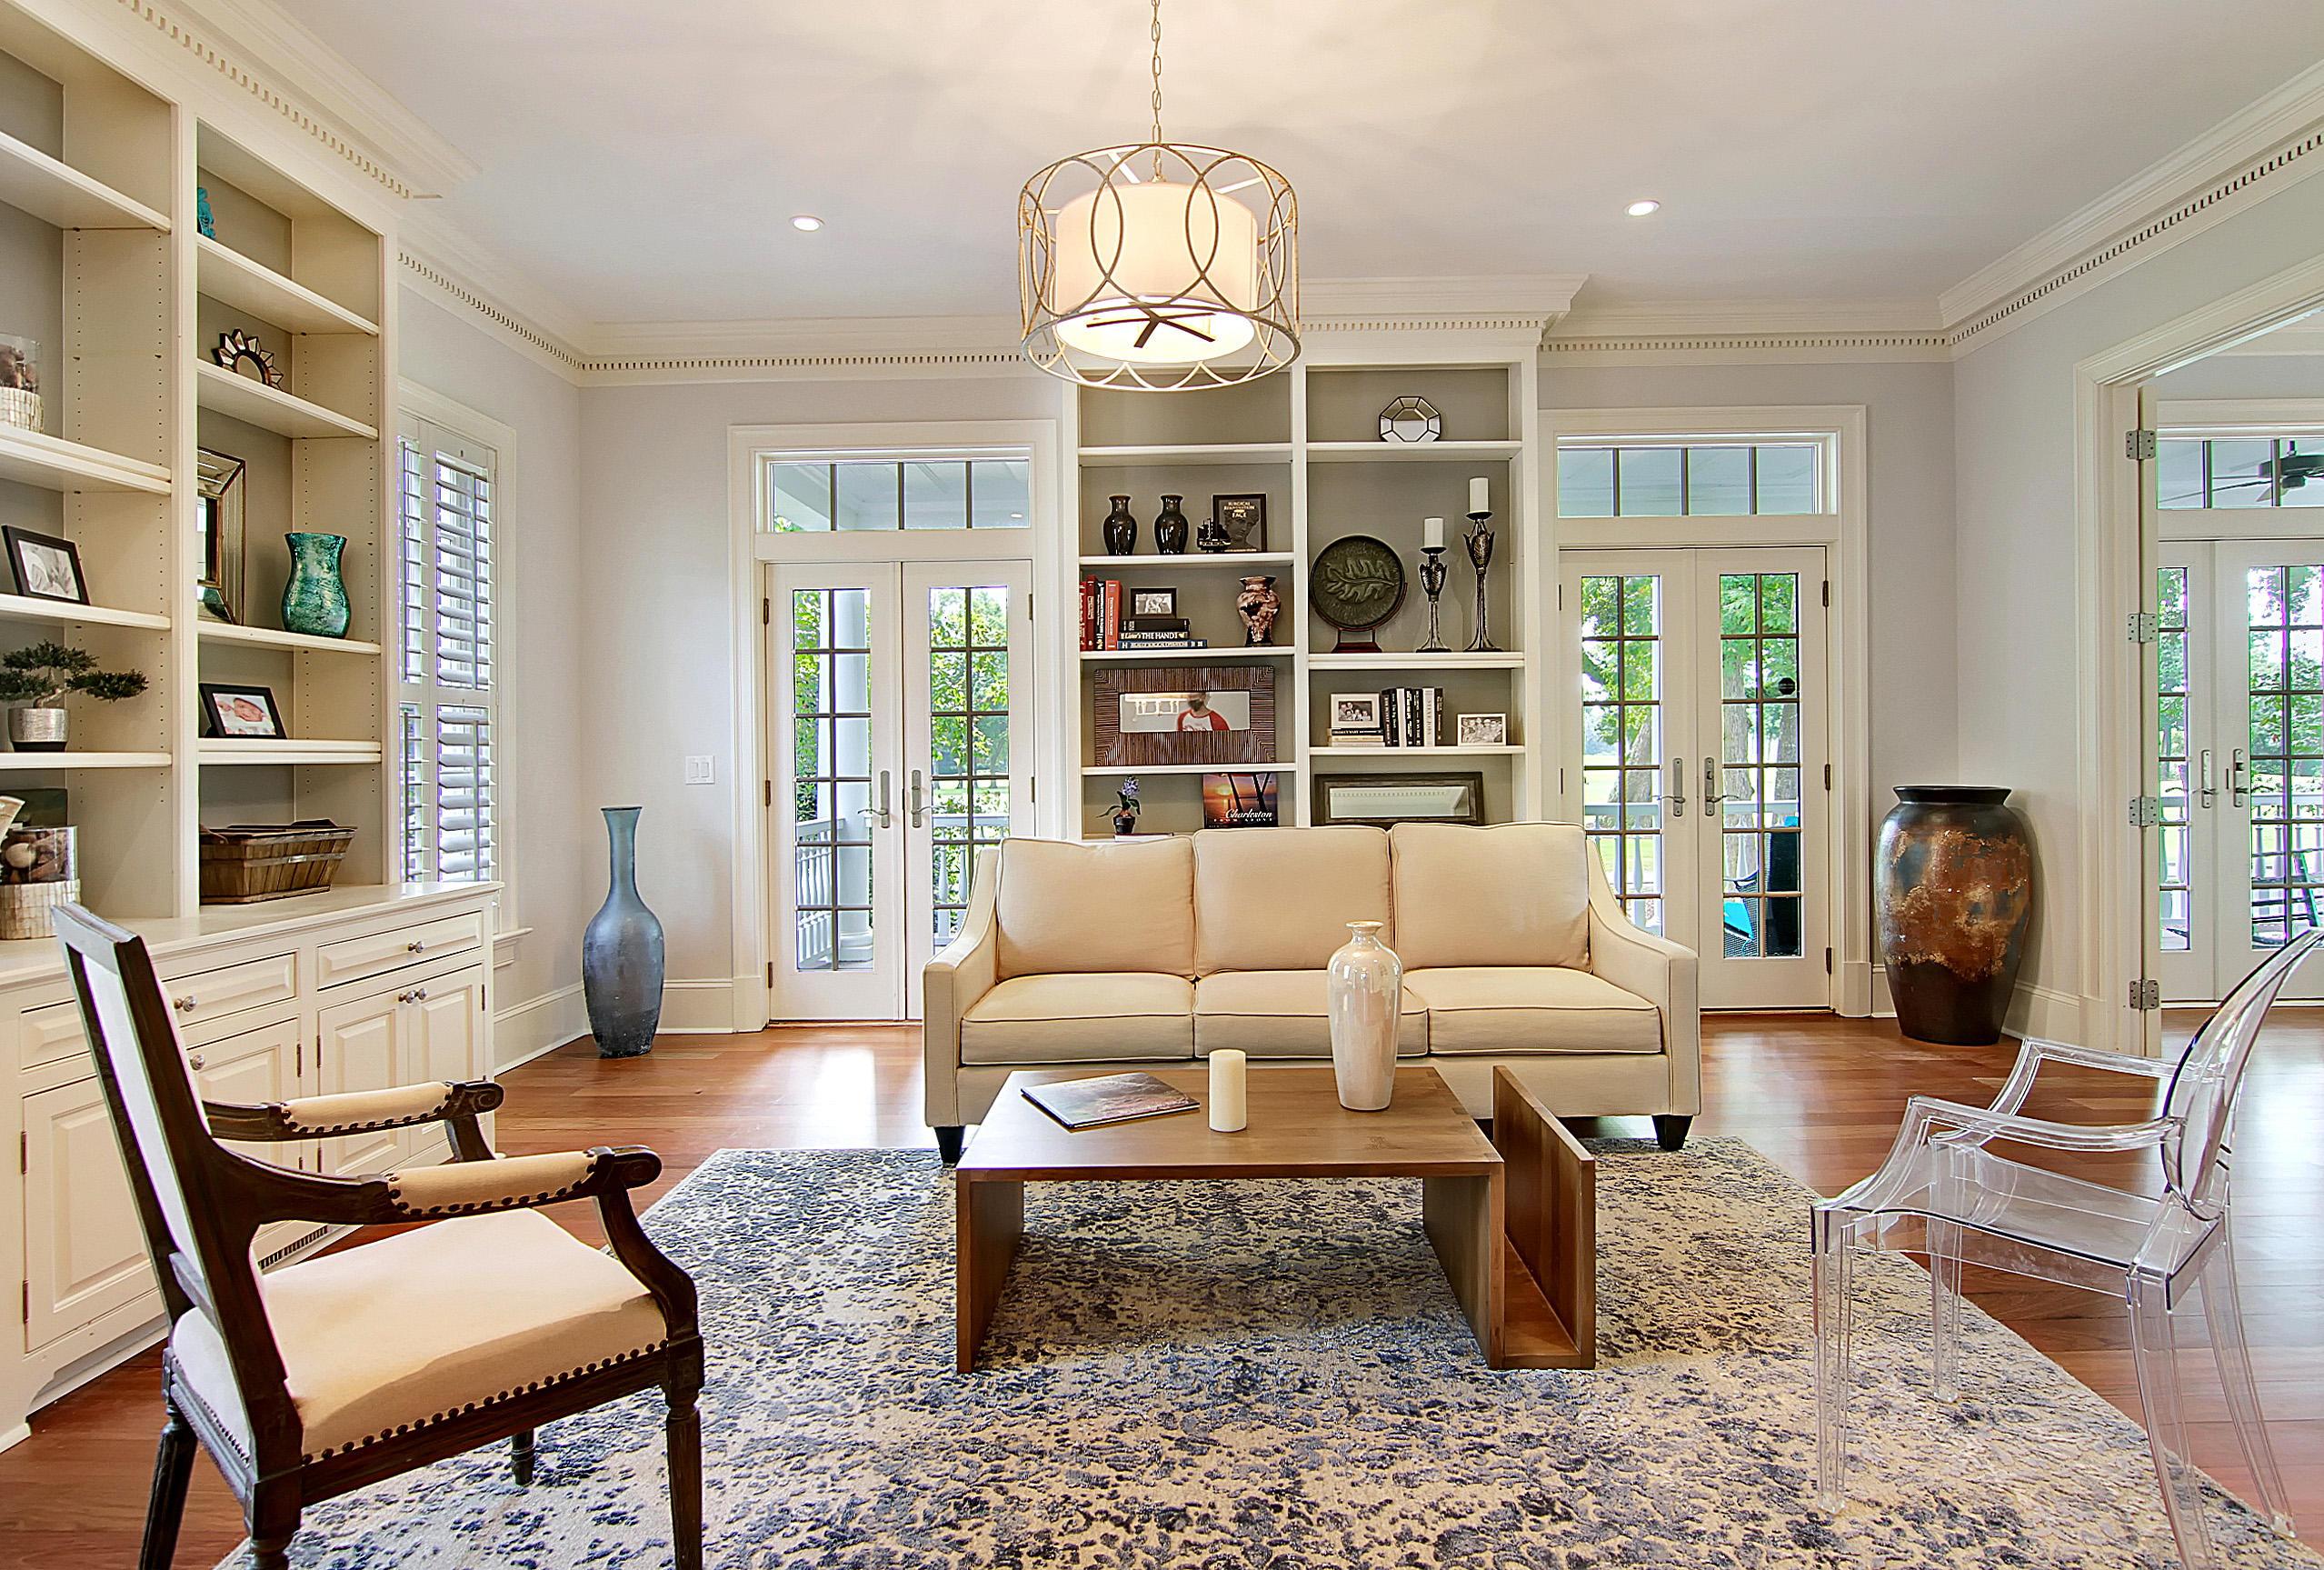 Daniel Island Homes For Sale - 79 Dalton, Charleston, SC - 61